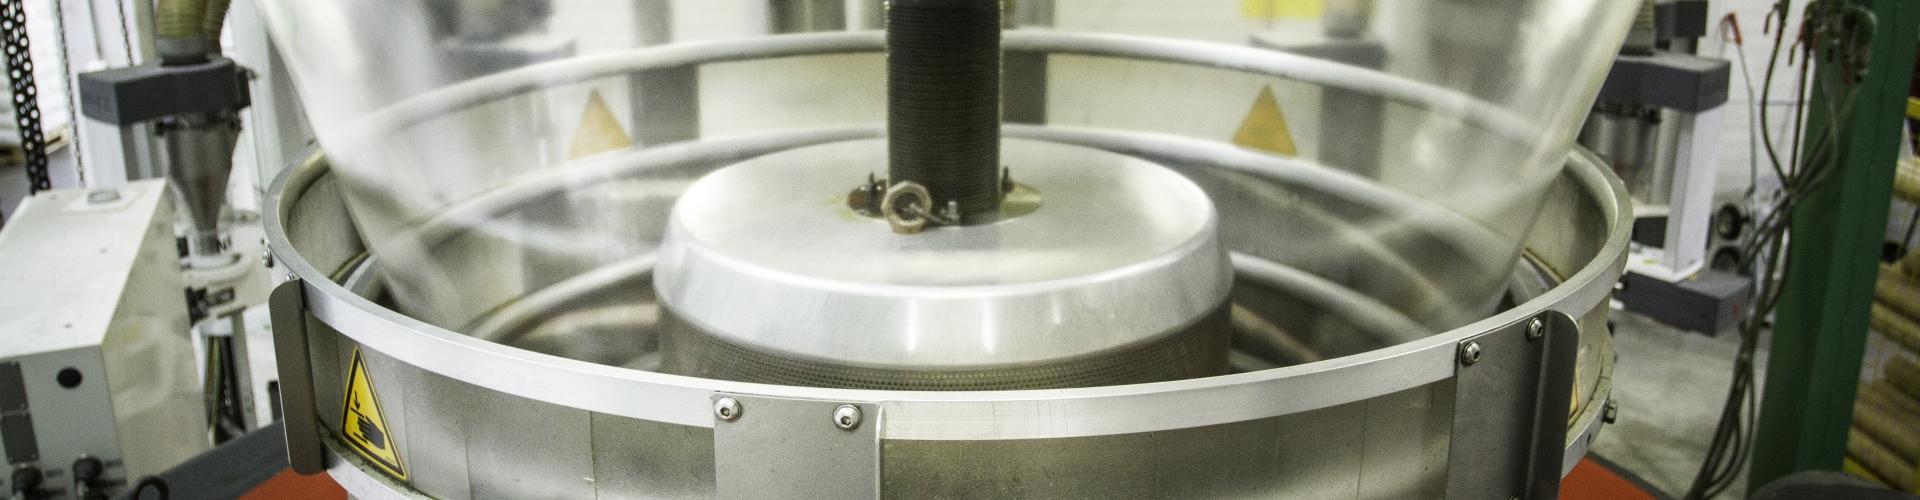 df579fe8a08 Production - Granitol a.s. - Granitol a.s.